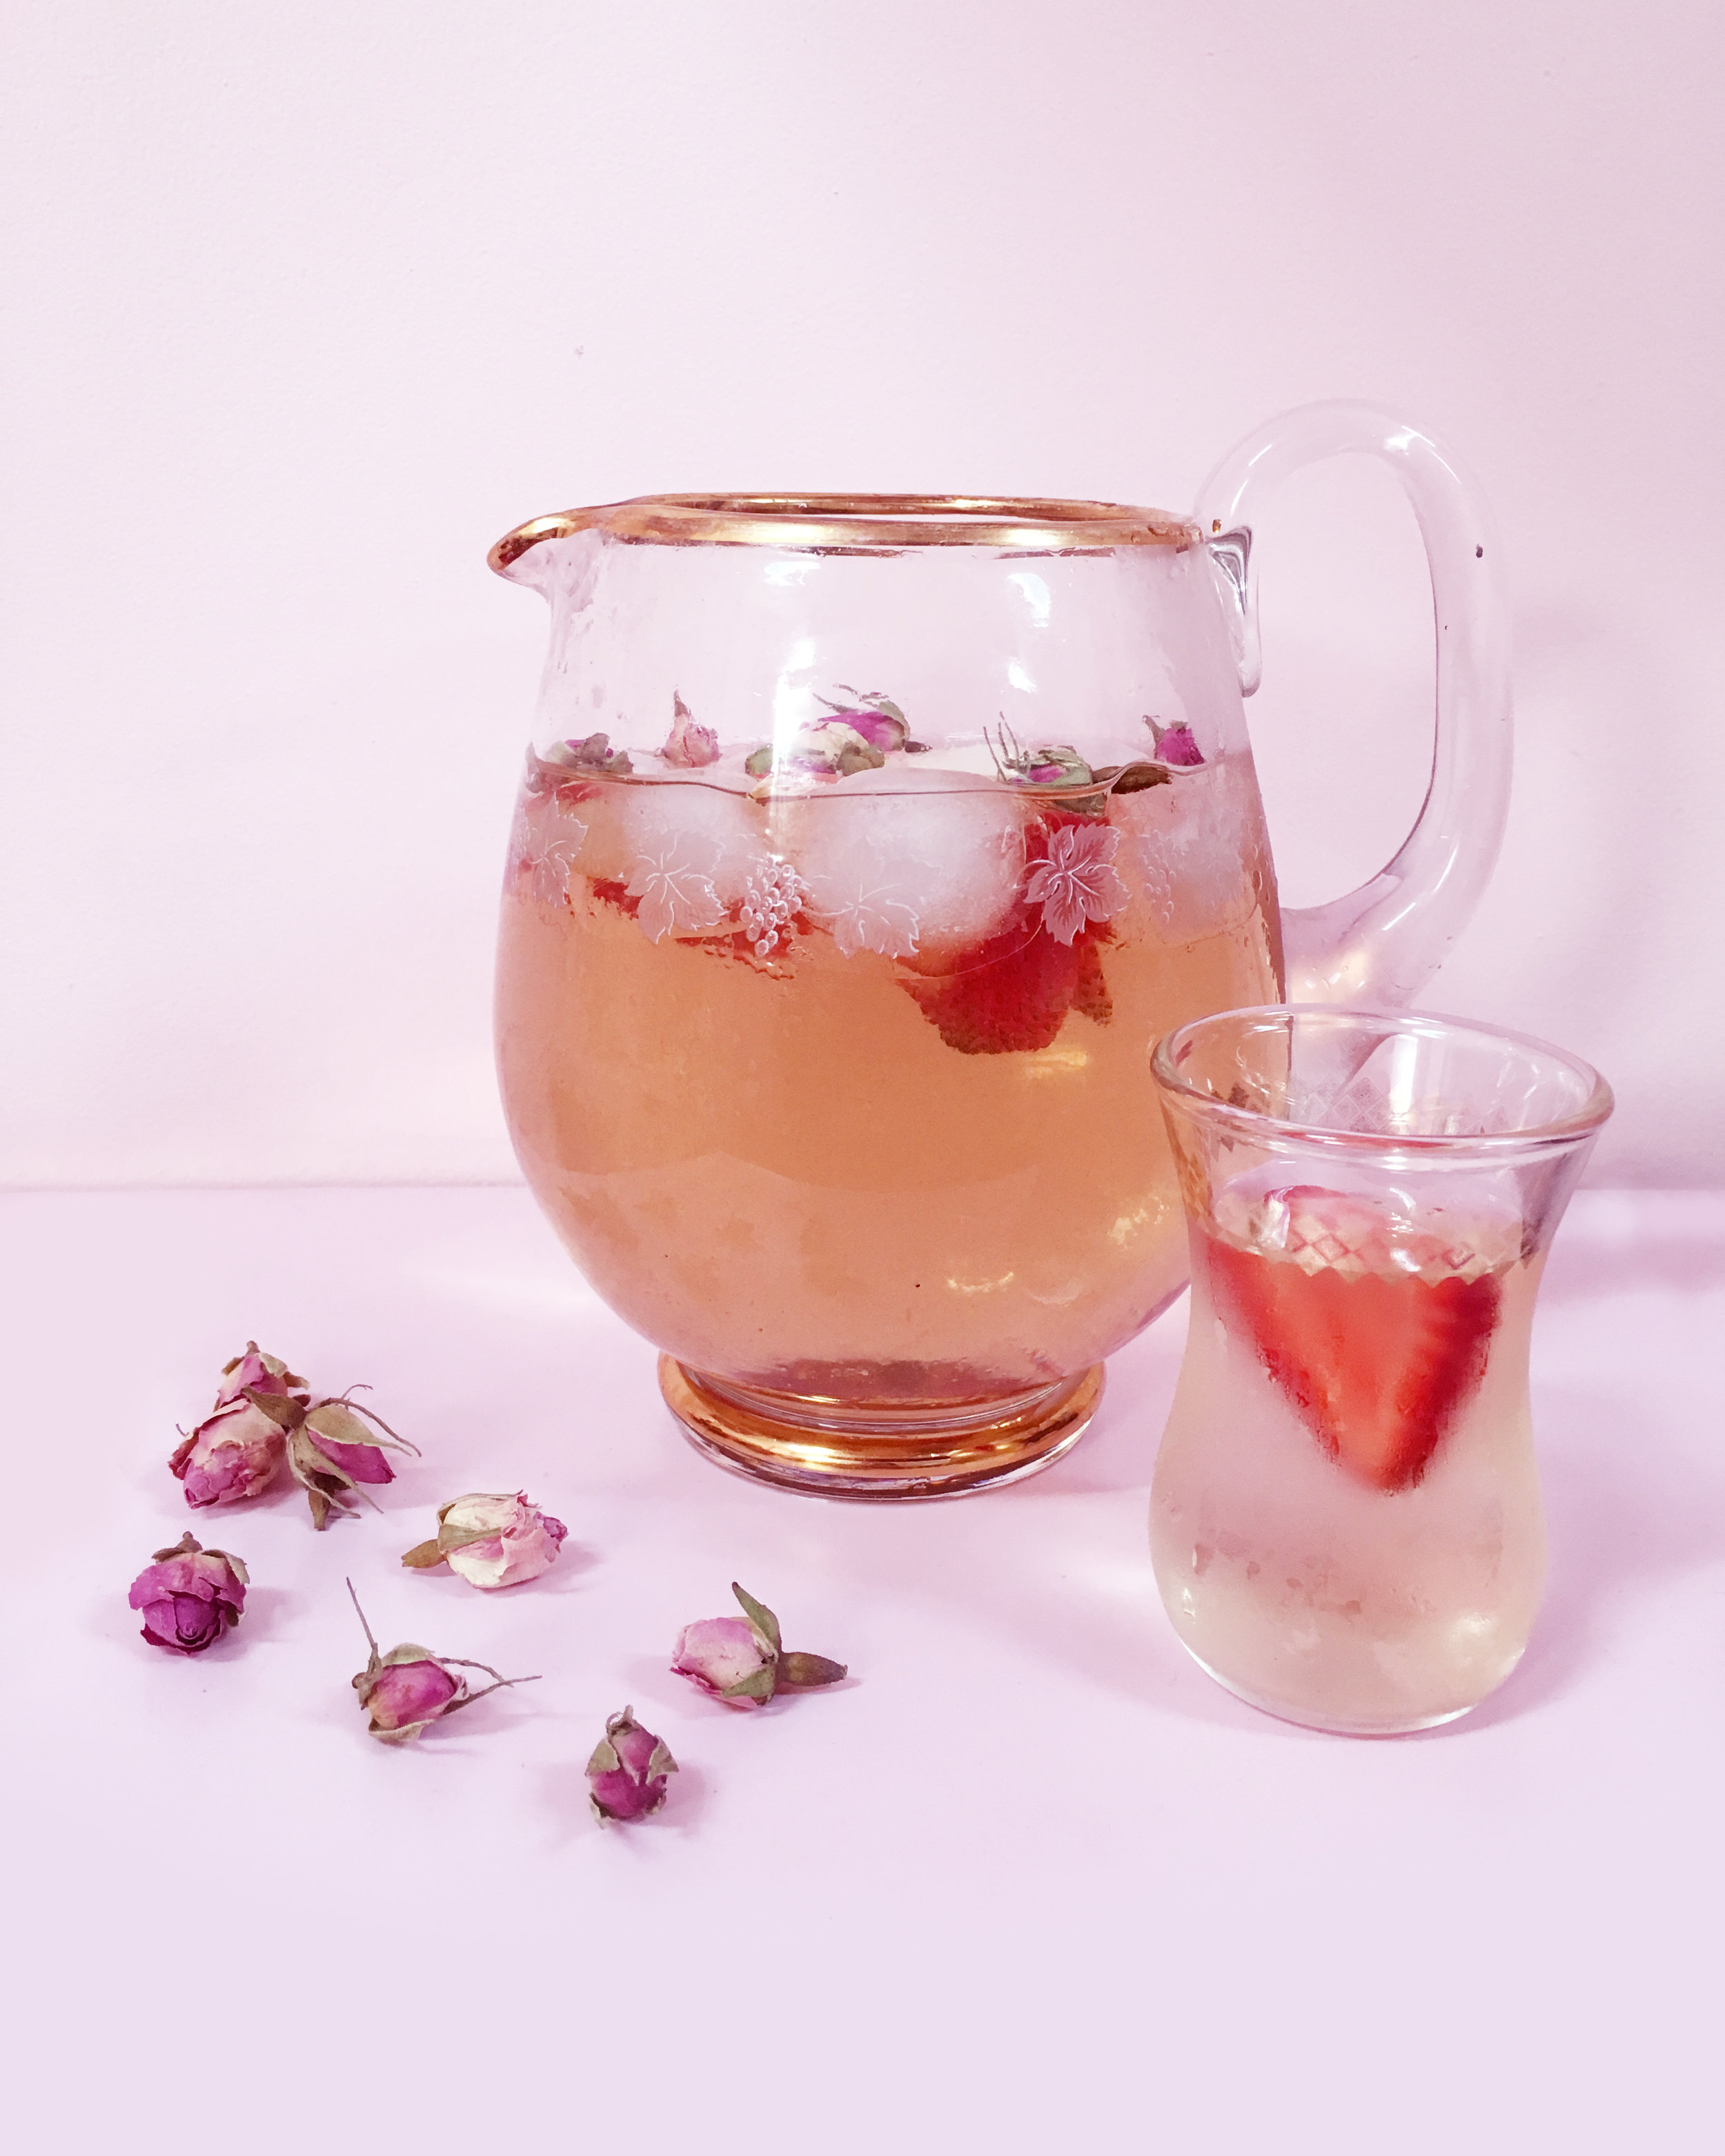 Summer-sipping-tea.jpg